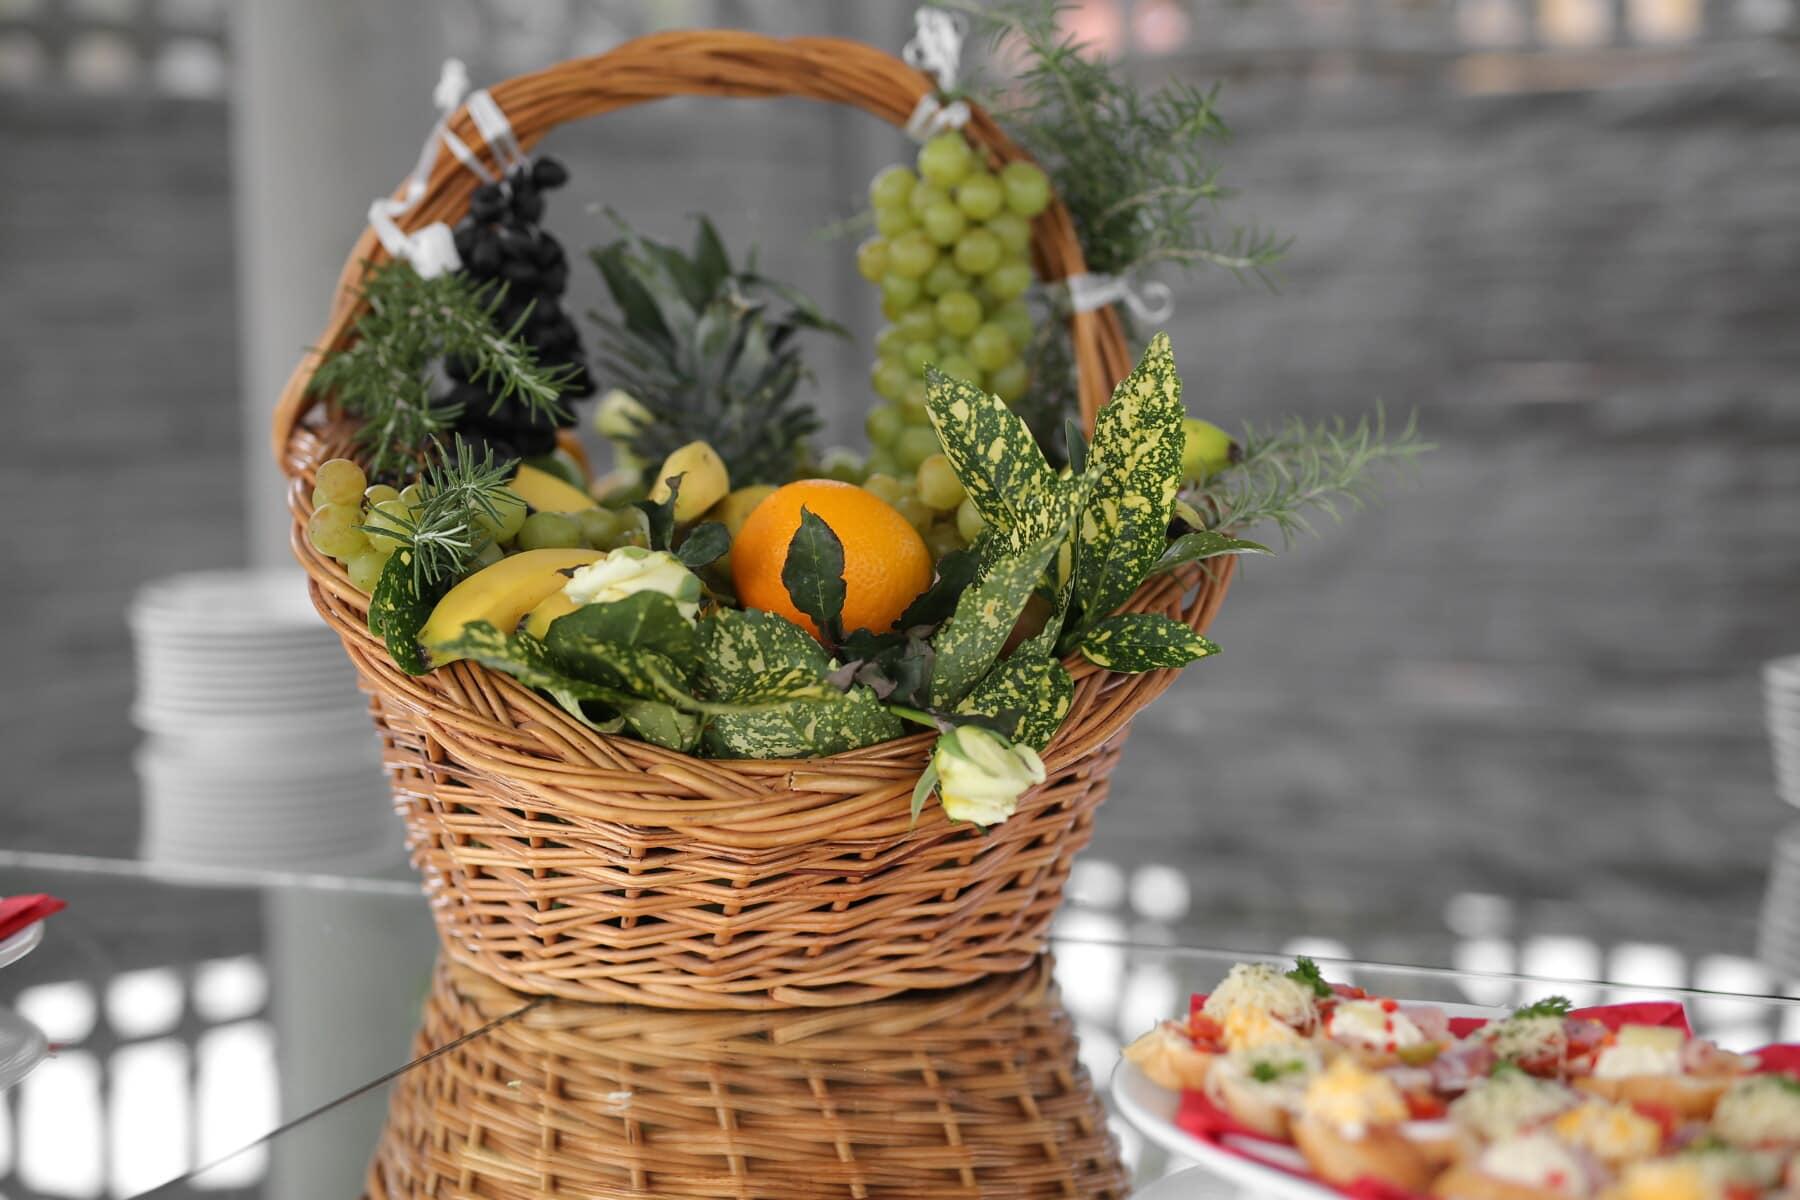 decorative, wicker basket, fruit, food, buffet, table, basket, leaf, delicious, fresh